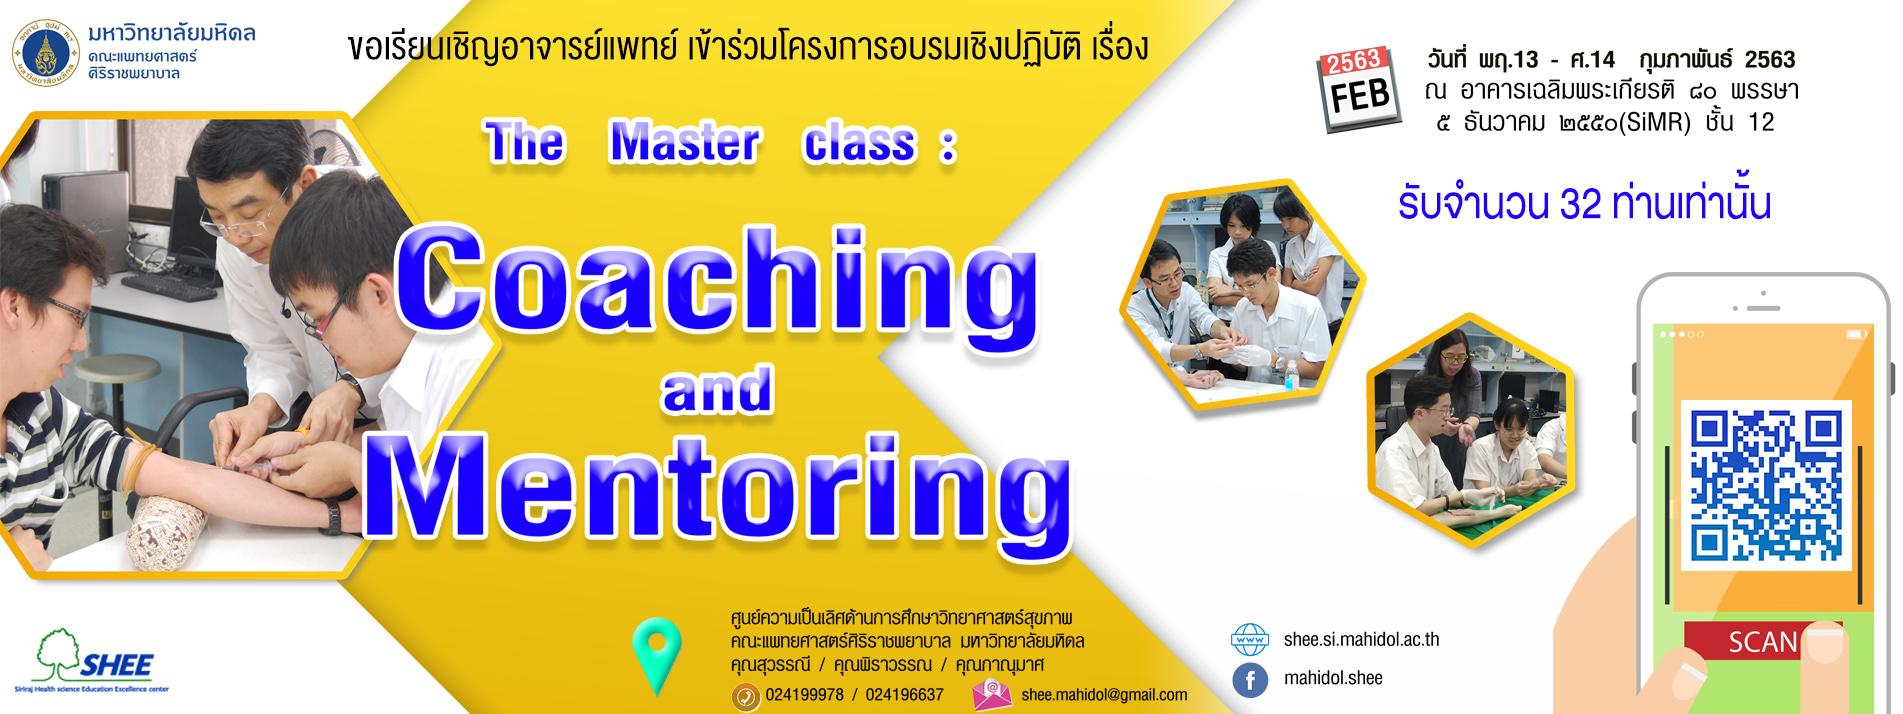 Assessment workshop for clinical teachers